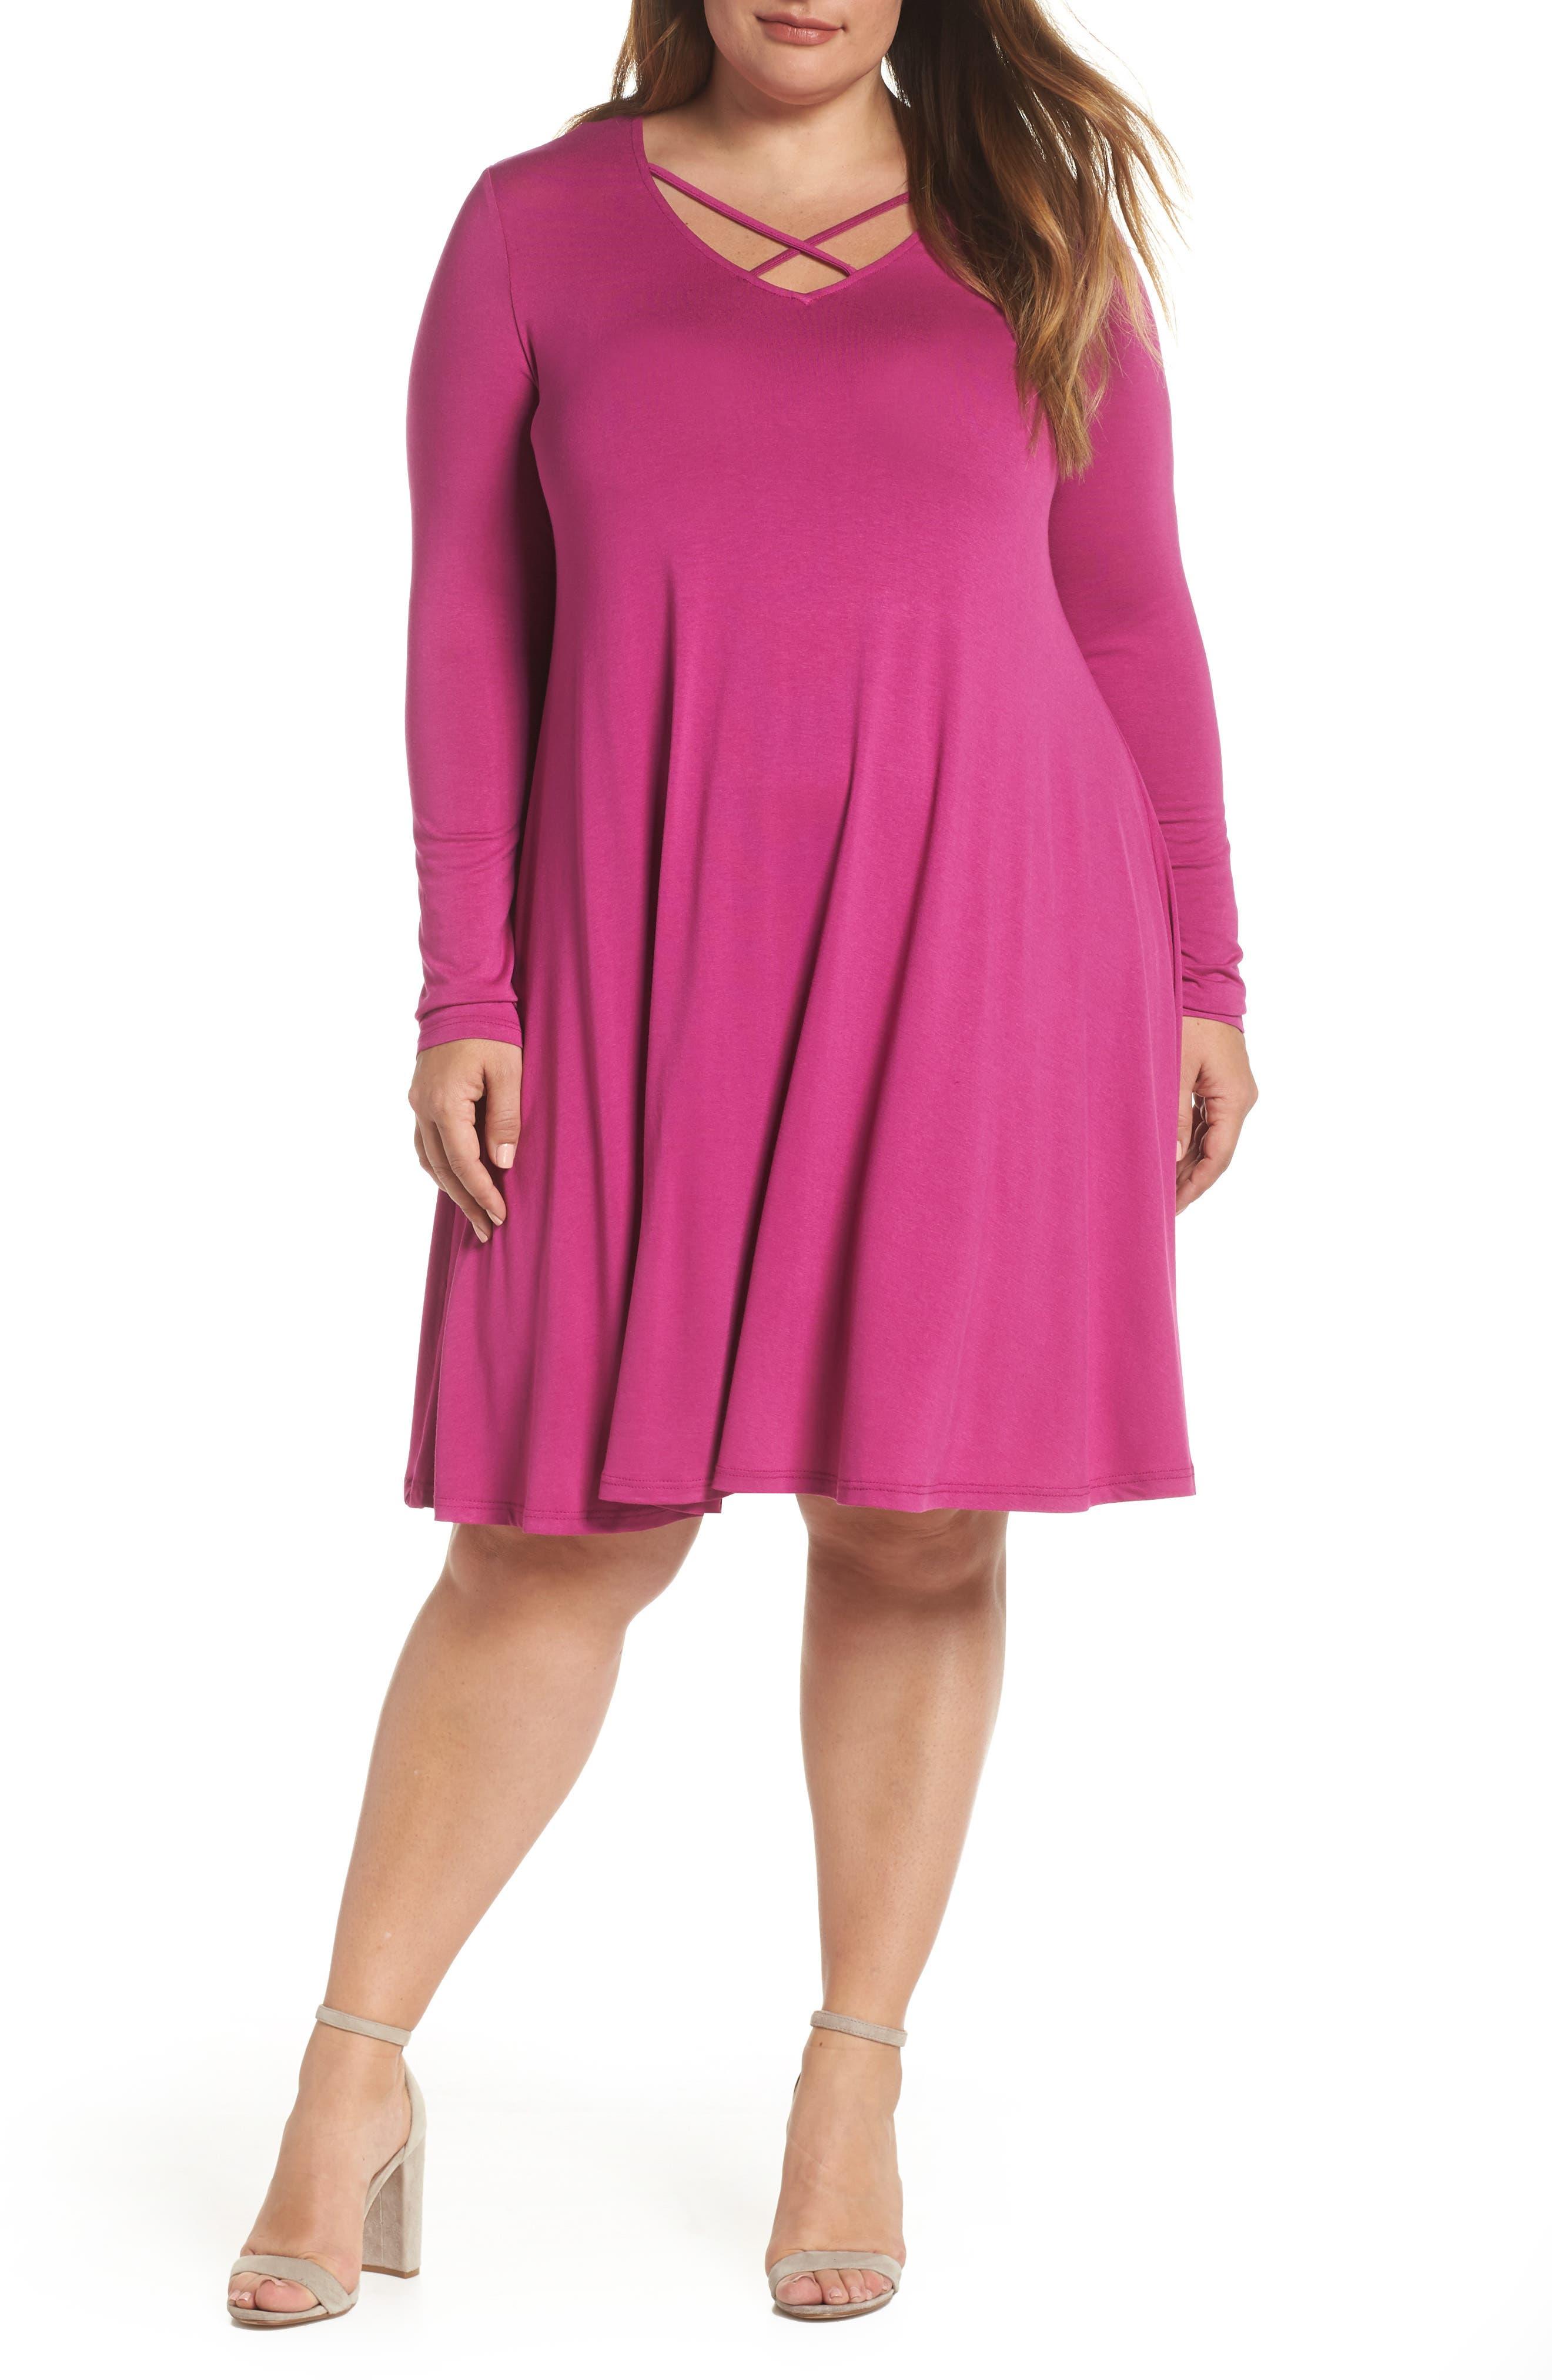 GLAMOROUS Neck Strap Detail Shift Dress in Cerise